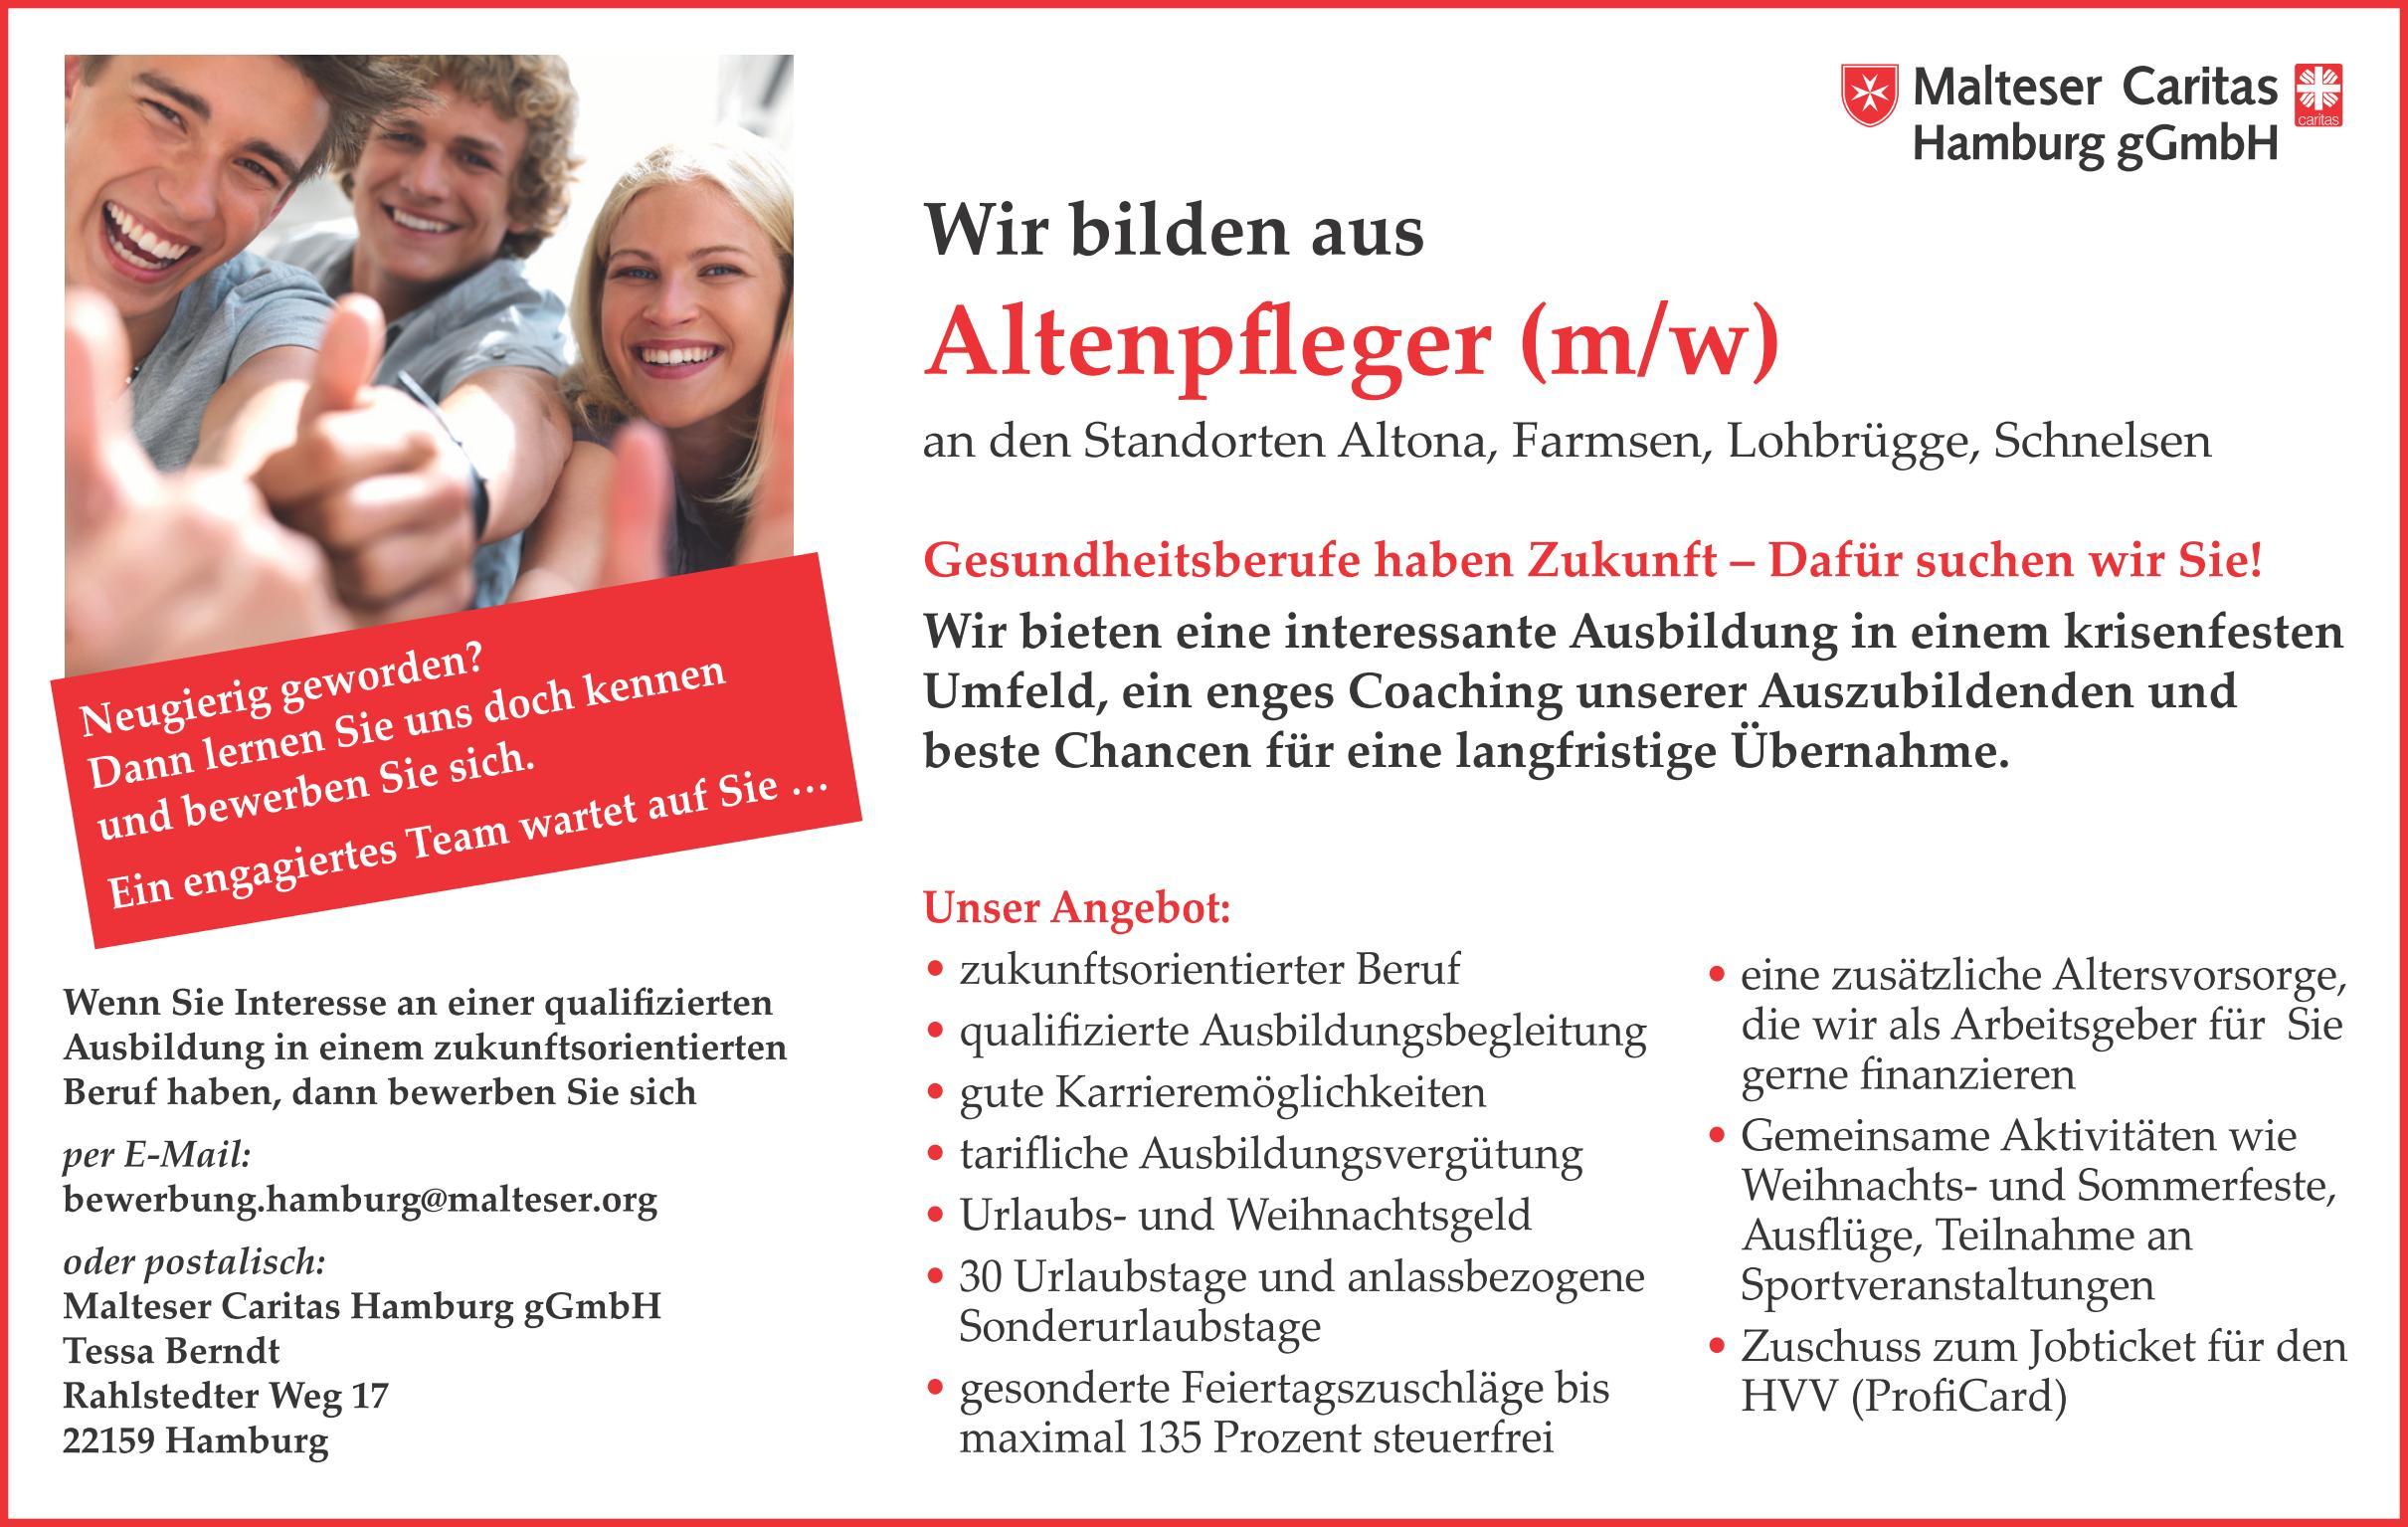 Altenpfleger (m/w)  an den Standorten Altona, Farmsen, Lohbrügge, Schnelsen - Malteser Caritas Hamburg gGmbH - in Hamburg - stellenecho.de